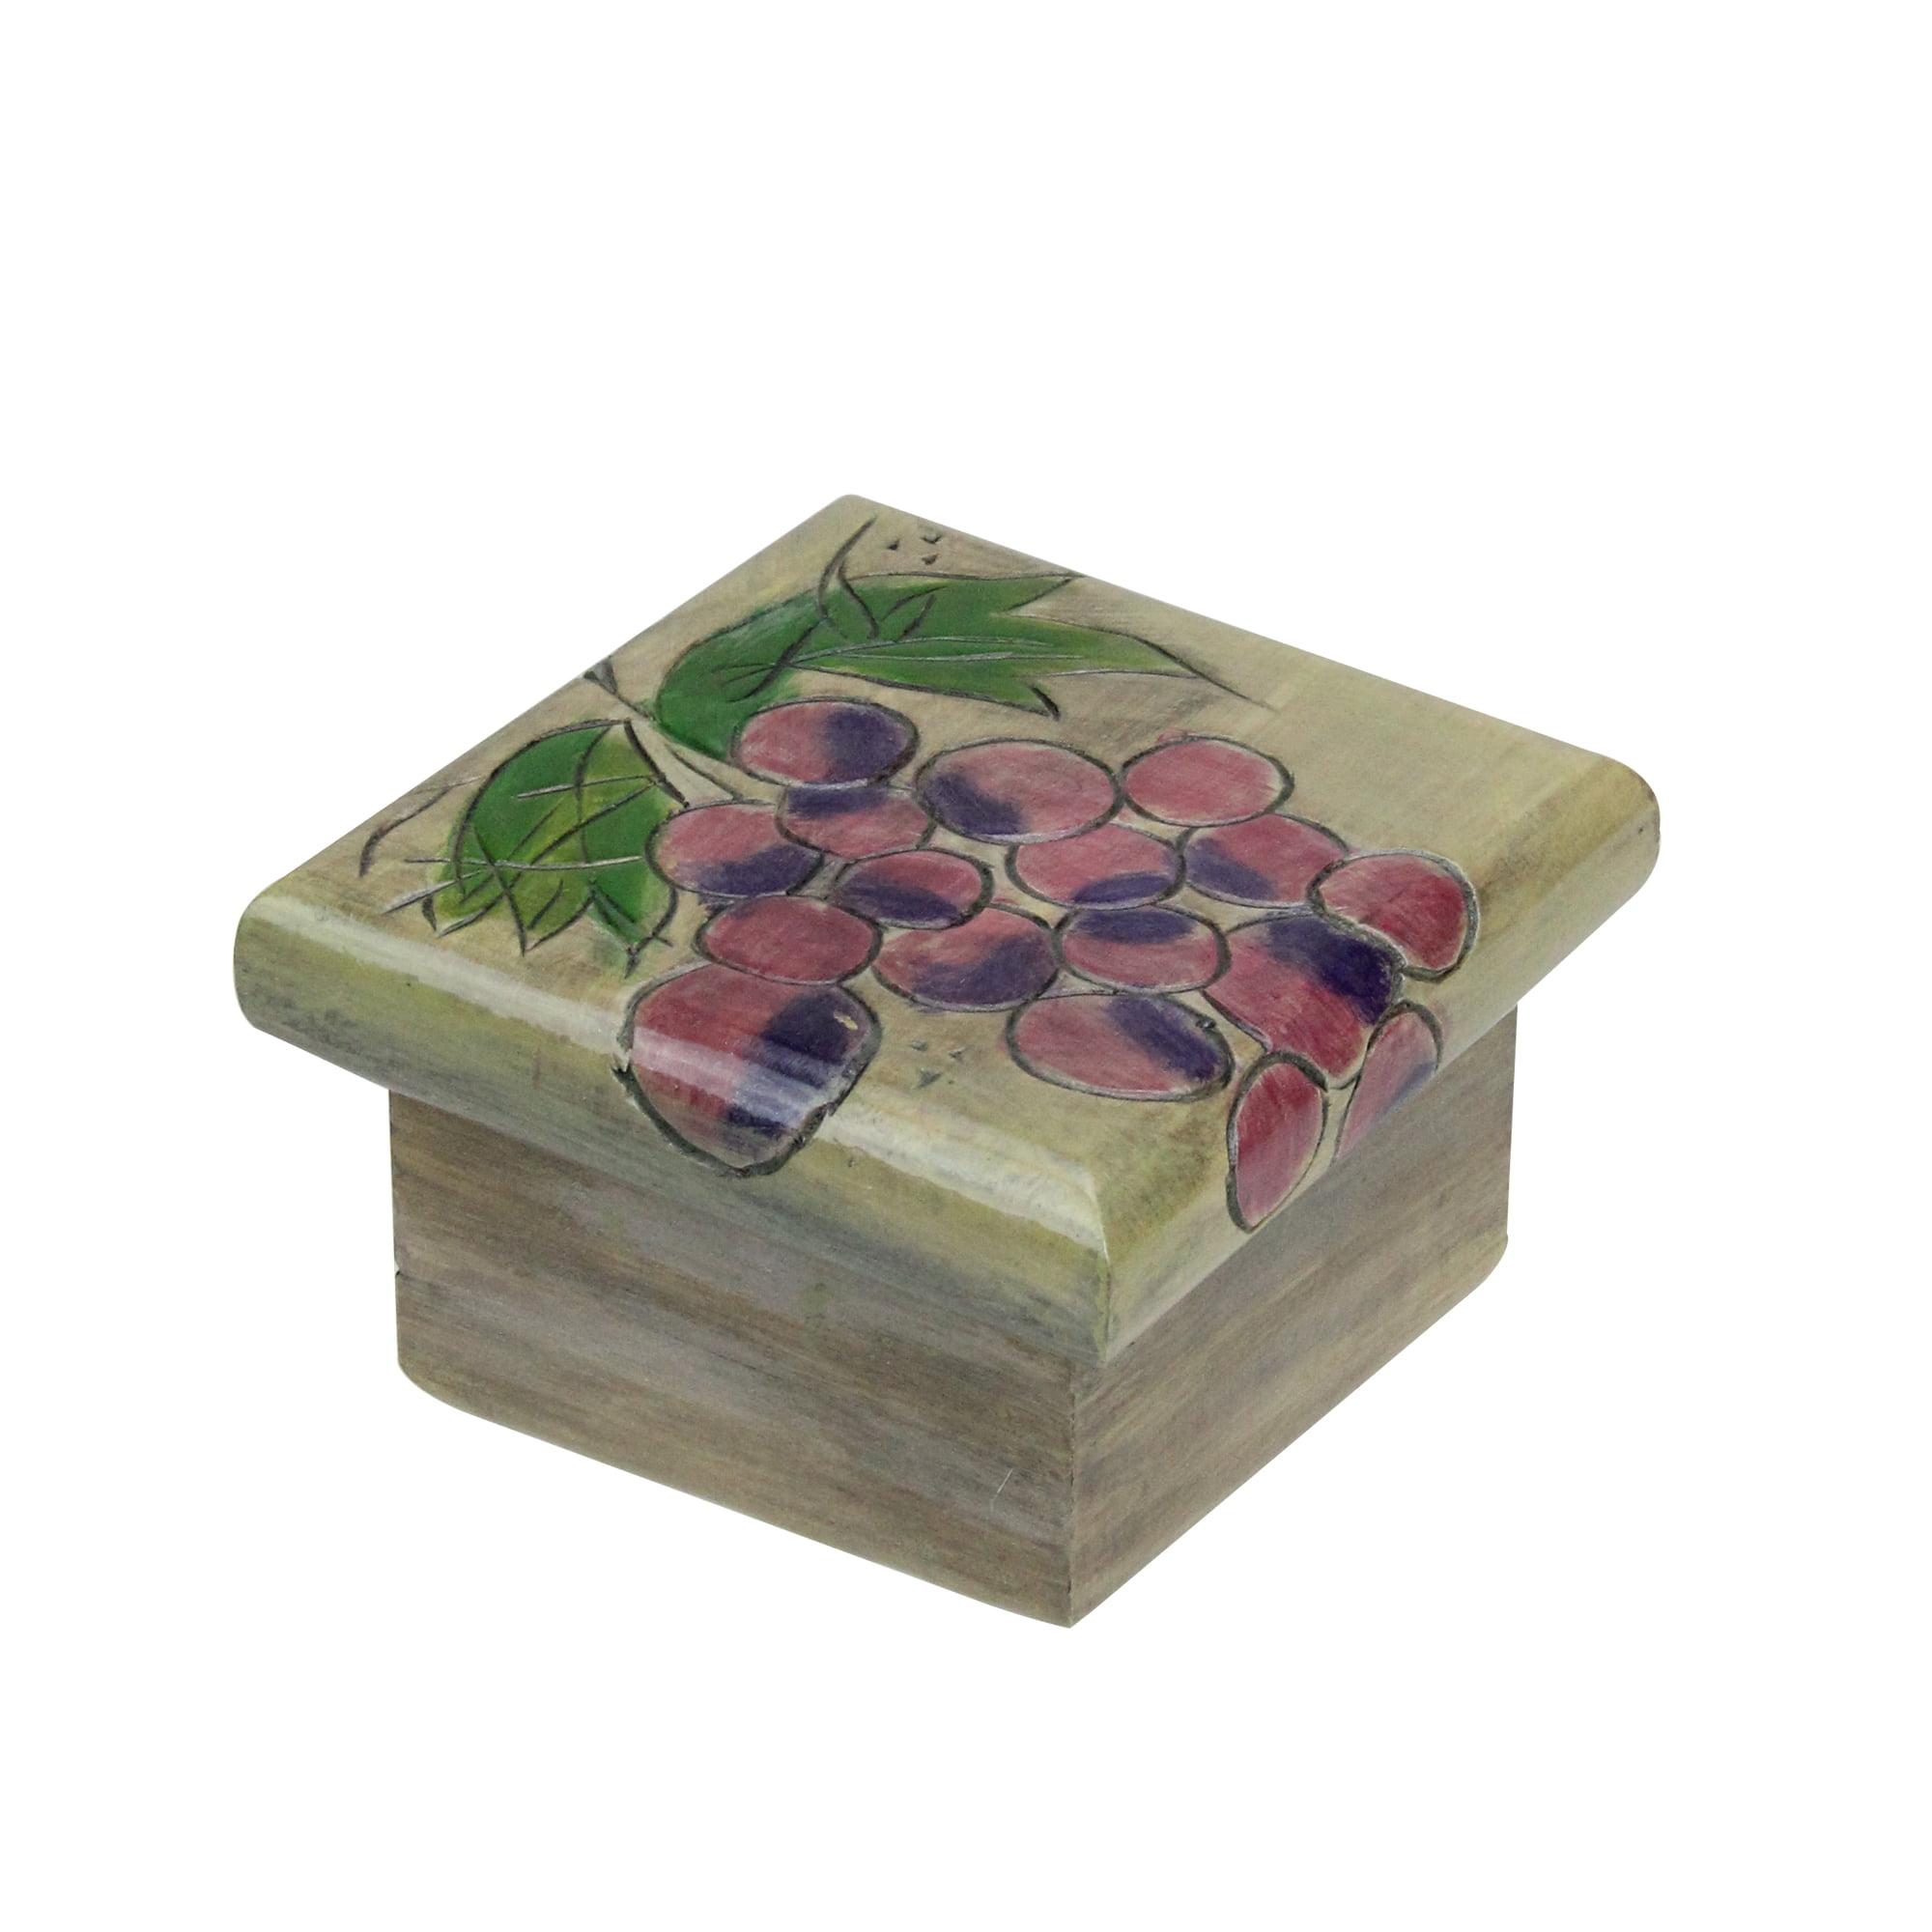 Kathy Lande Cluster Of Grapes Wooden Jewelry Keepsake Box